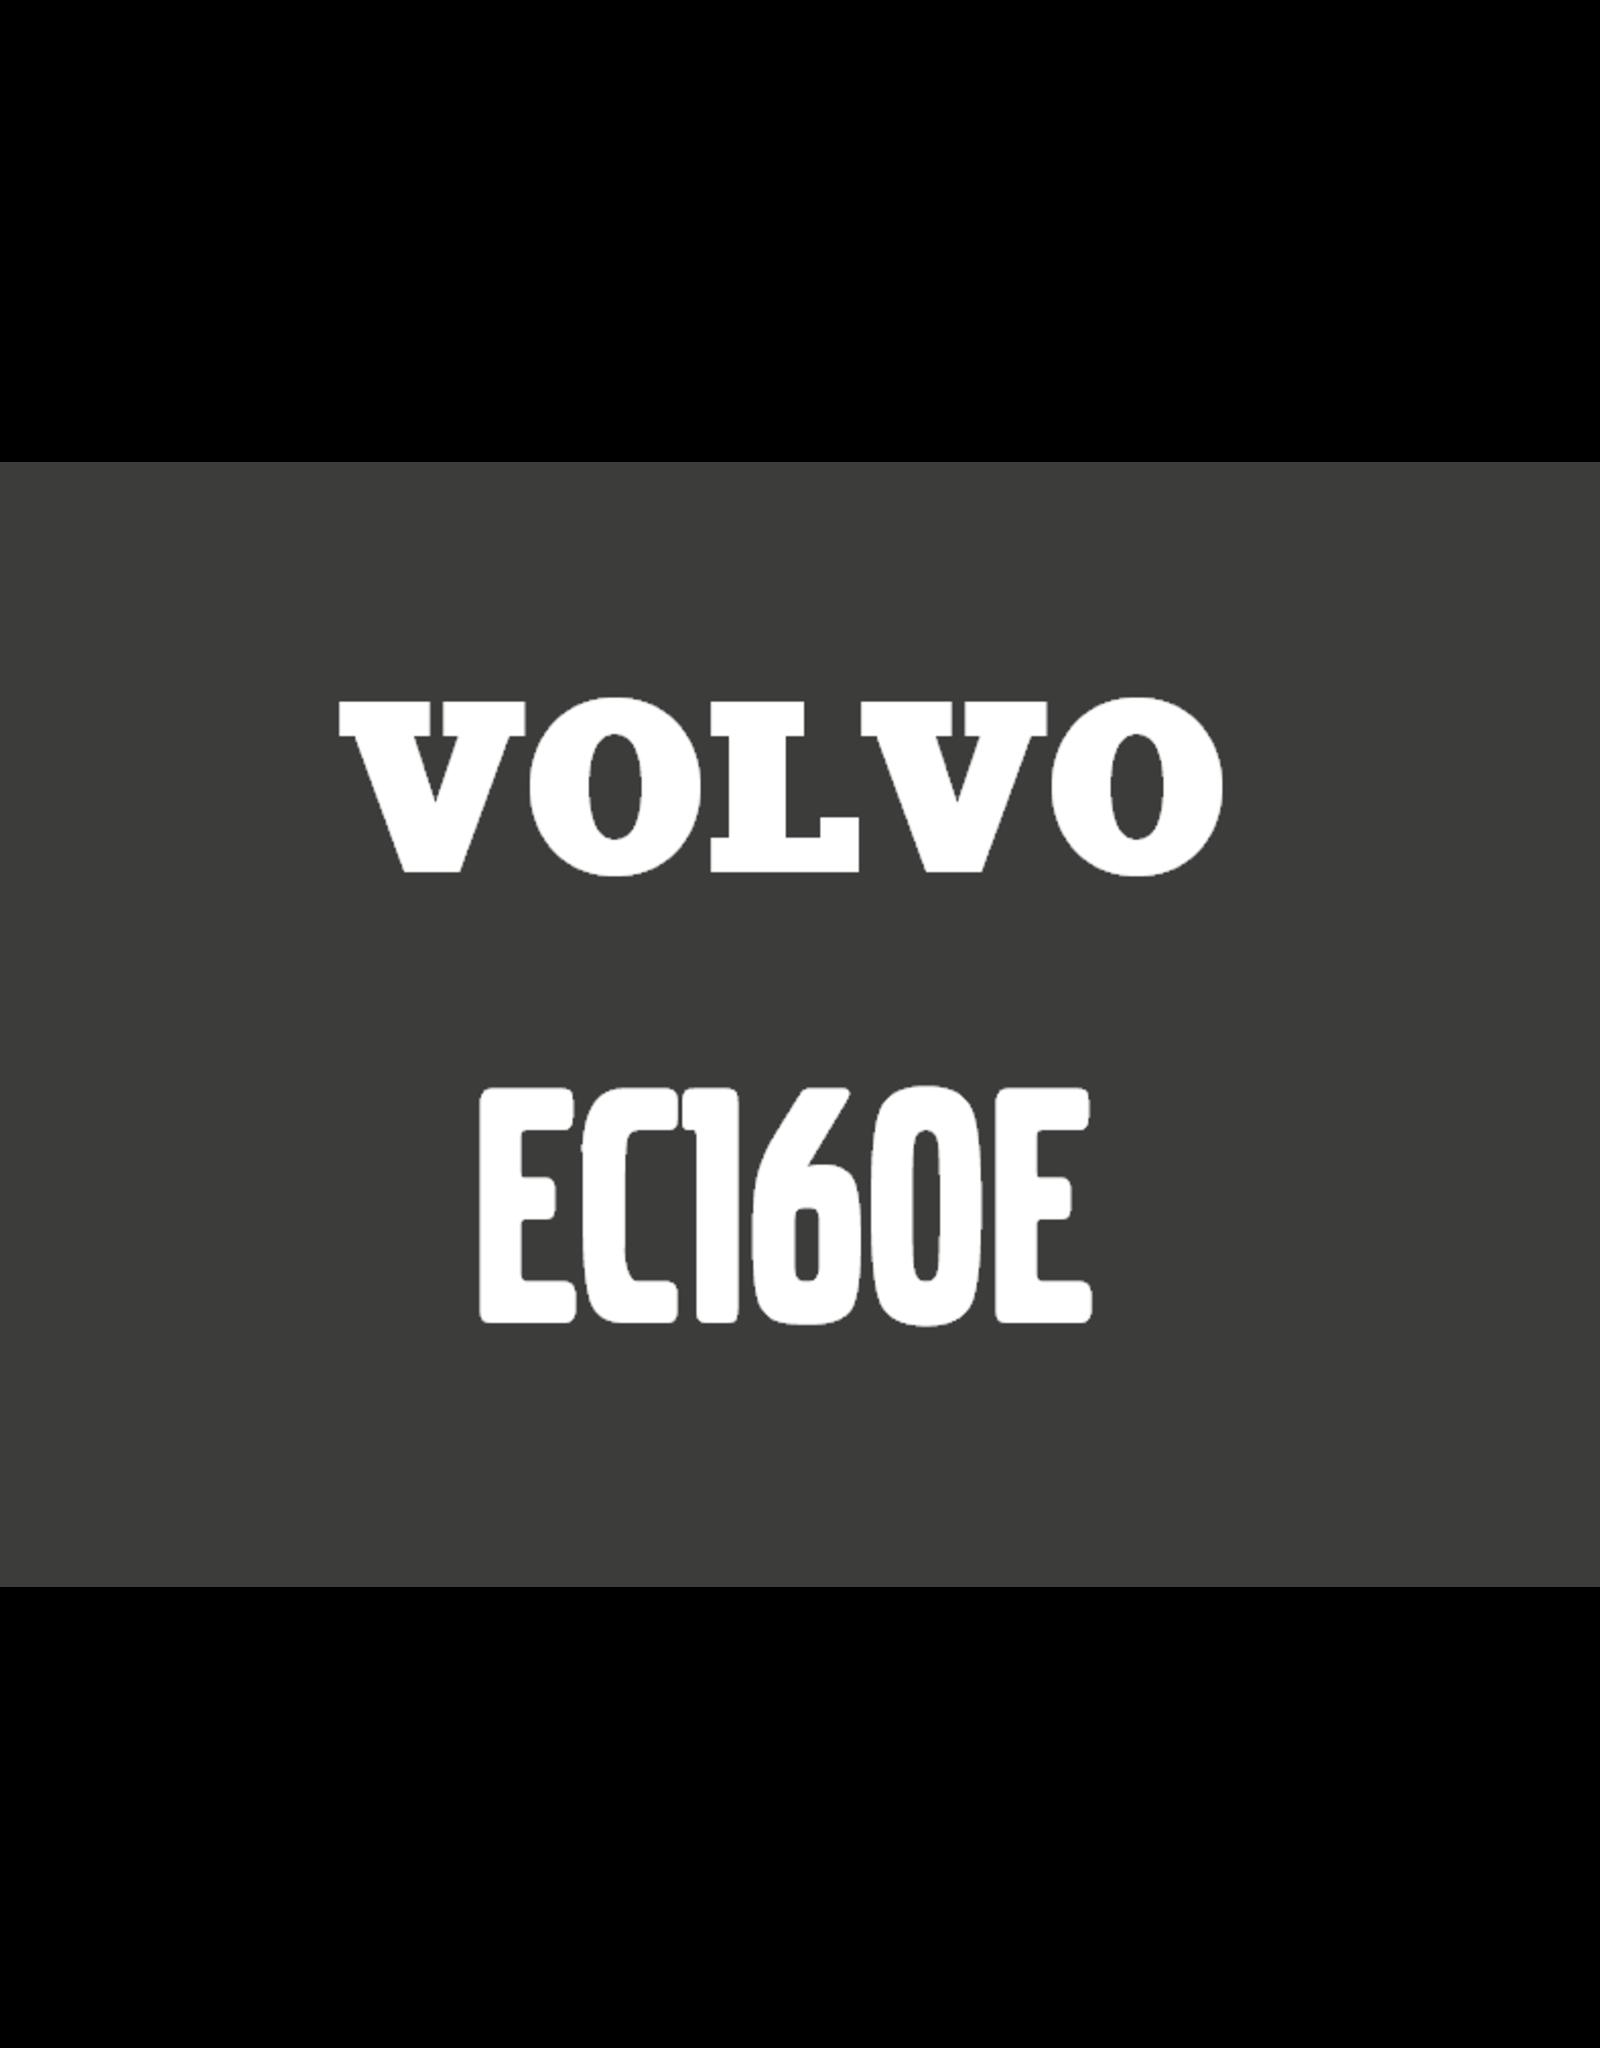 Echle Hartstahl GmbH FOPS für Volvo EC160E